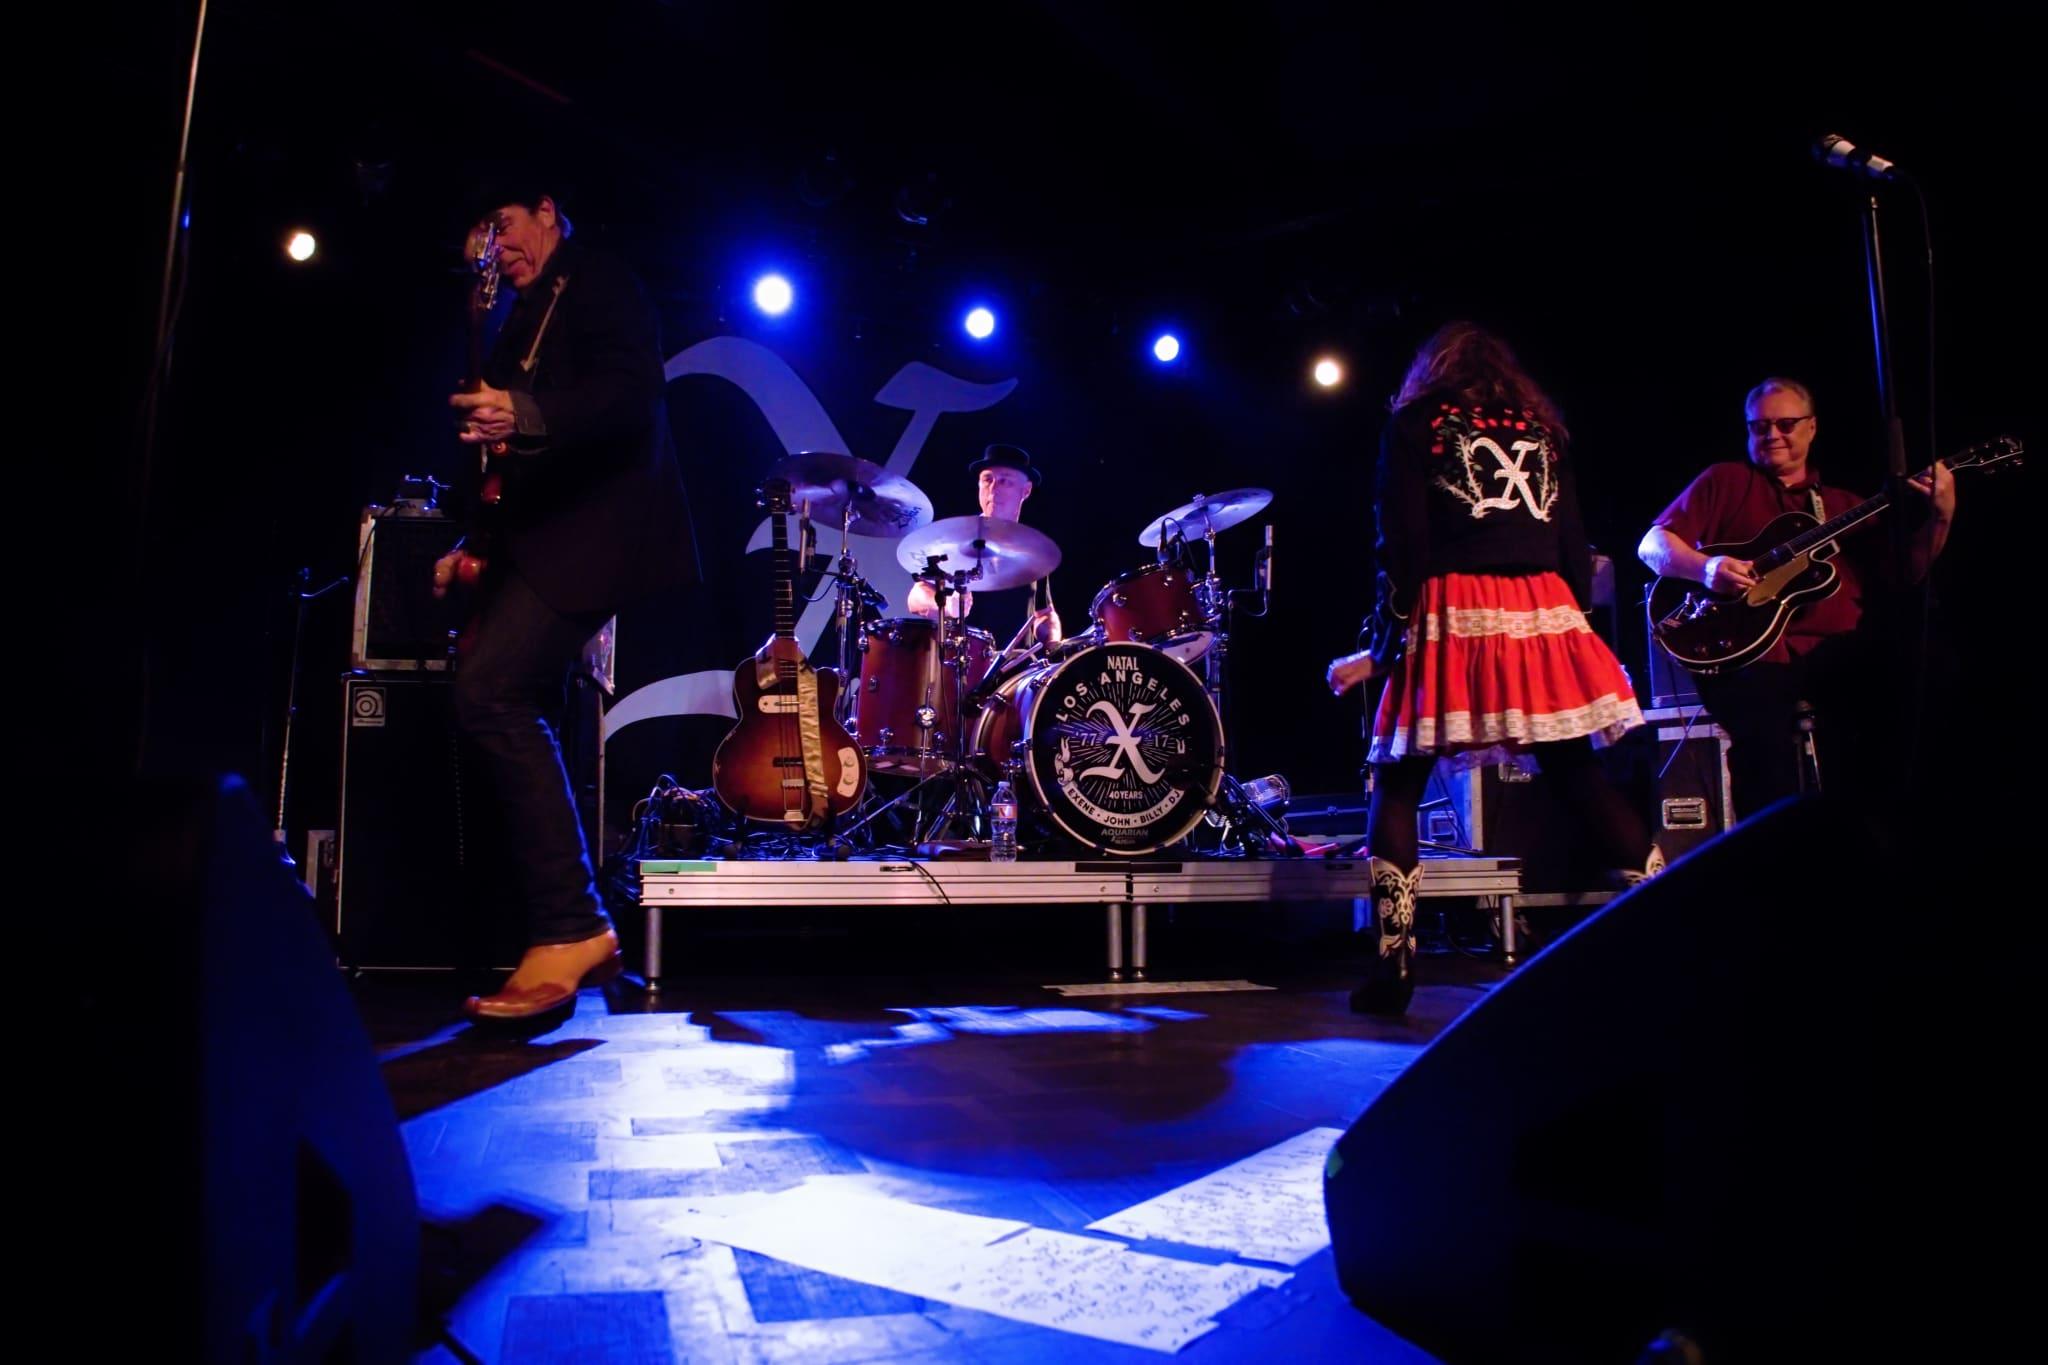 X-mas '19 Holiday Tour Brings Legendary Band X Back to Sac via @sacramentopress